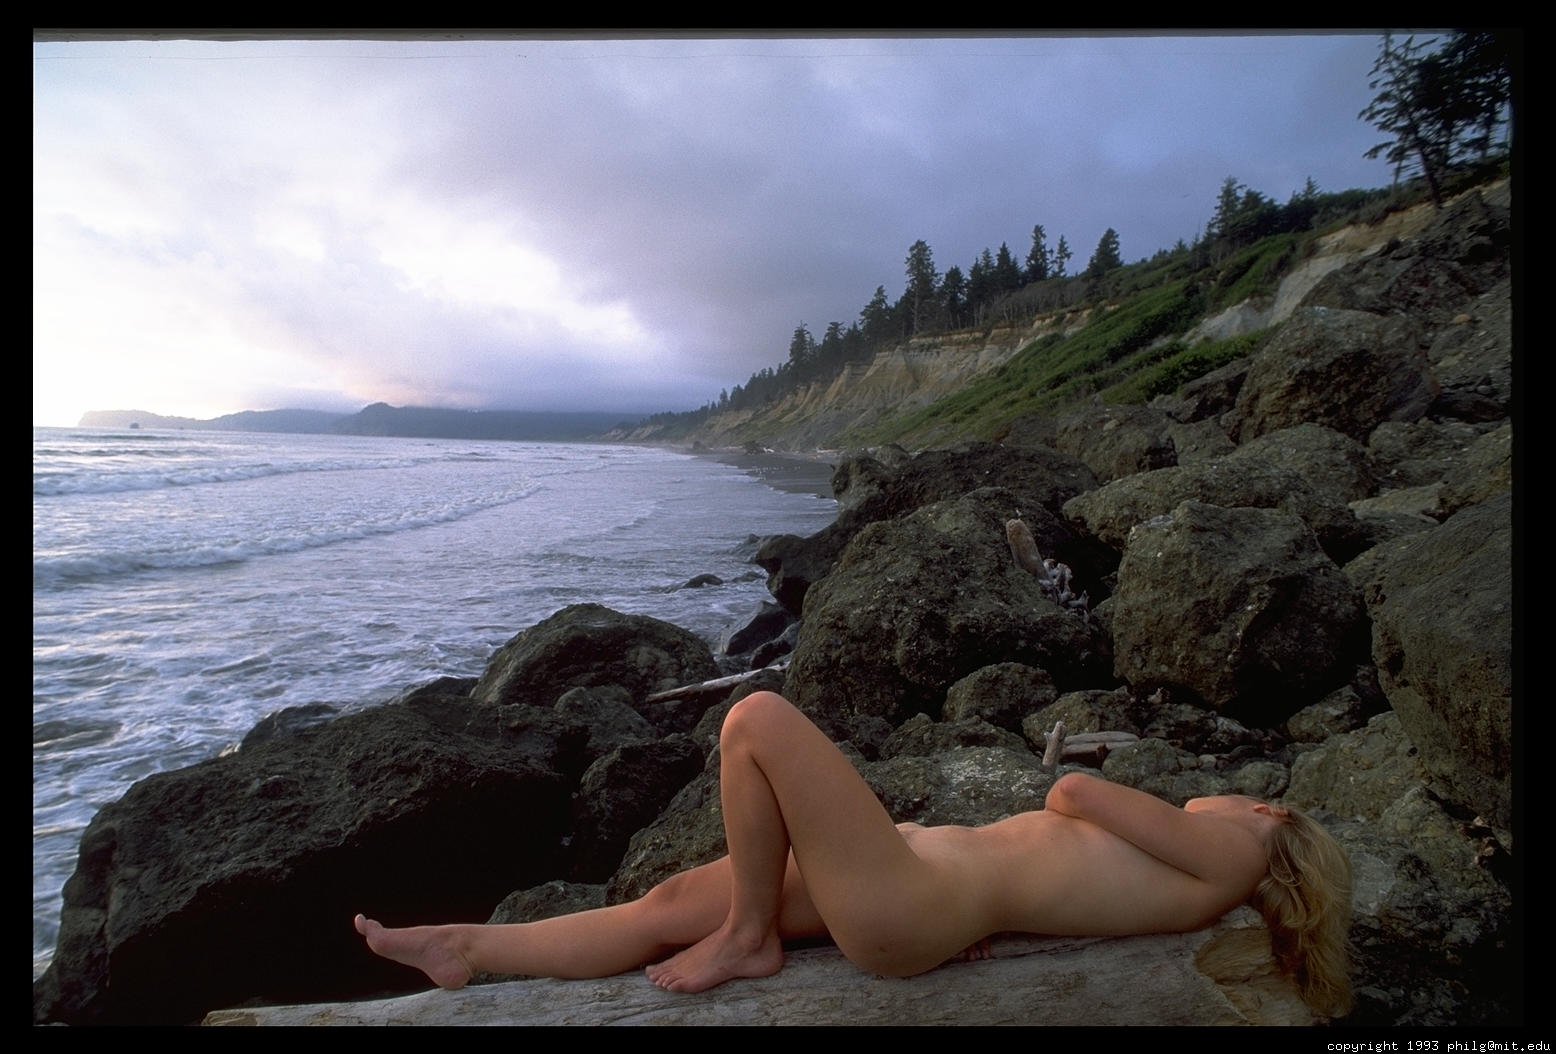 nude beaches in washington